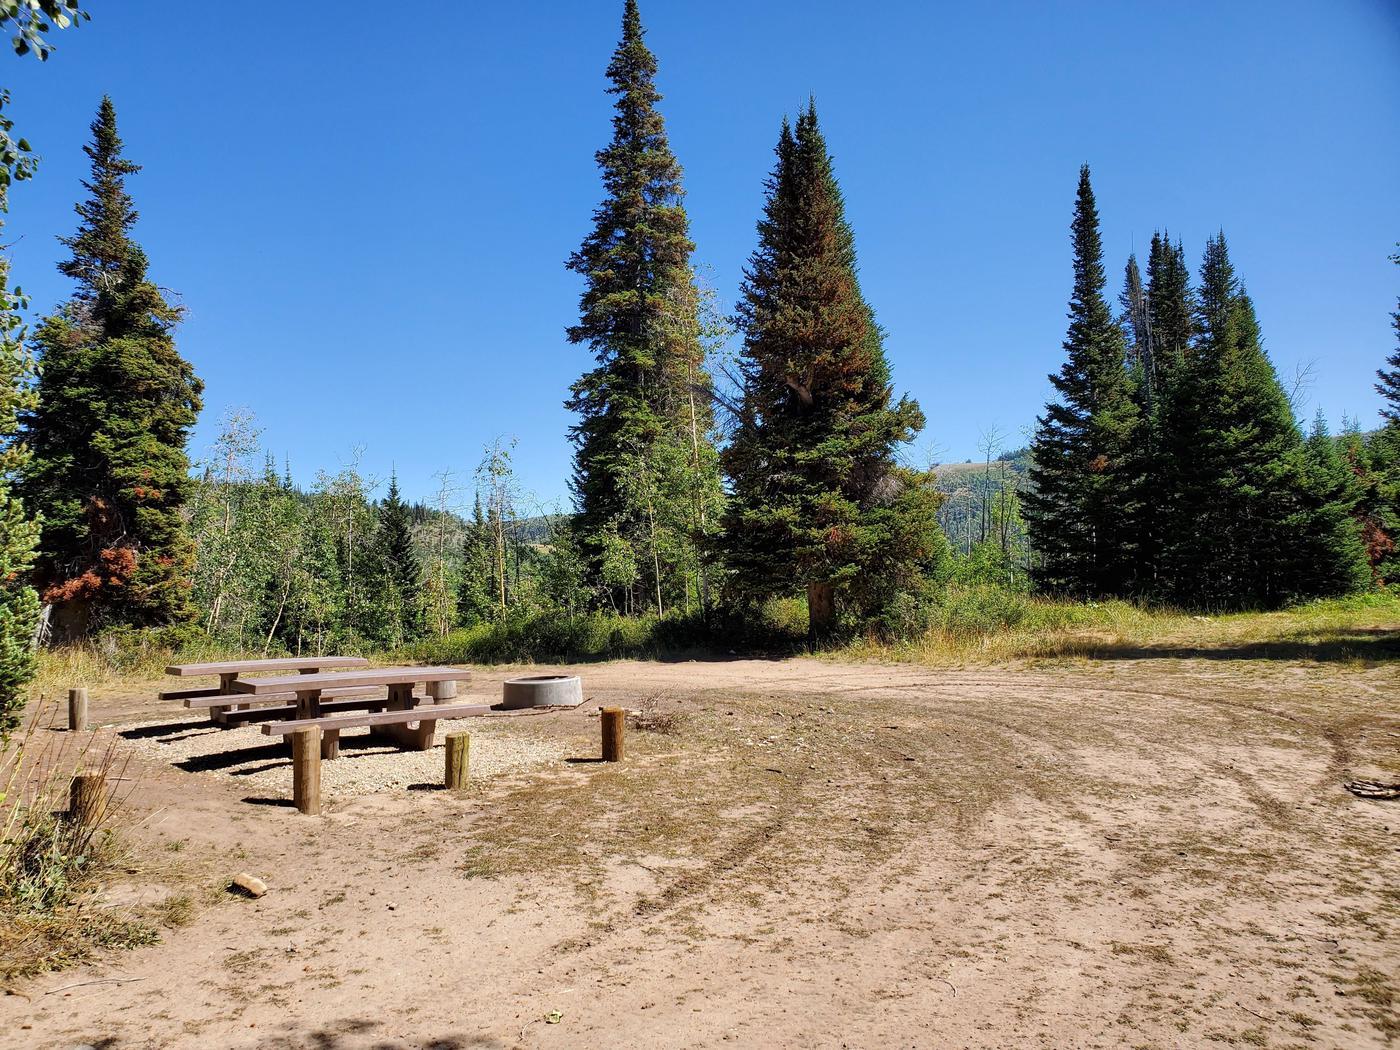 Lake Canyon Campground - Site 11